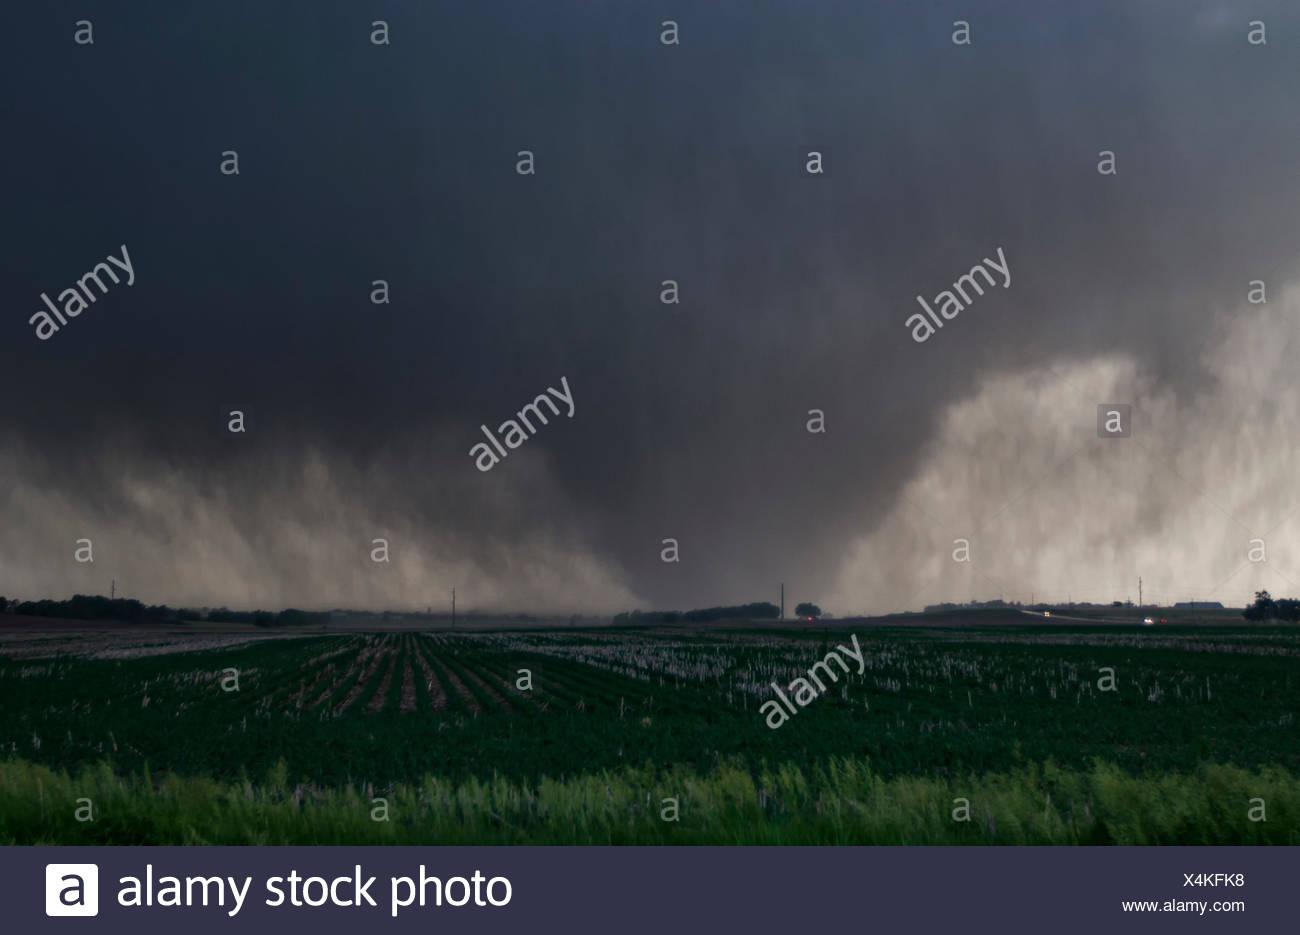 A violent, rain-wrapped wedge tornado rips up farmland in rural Kansas - Stock Image